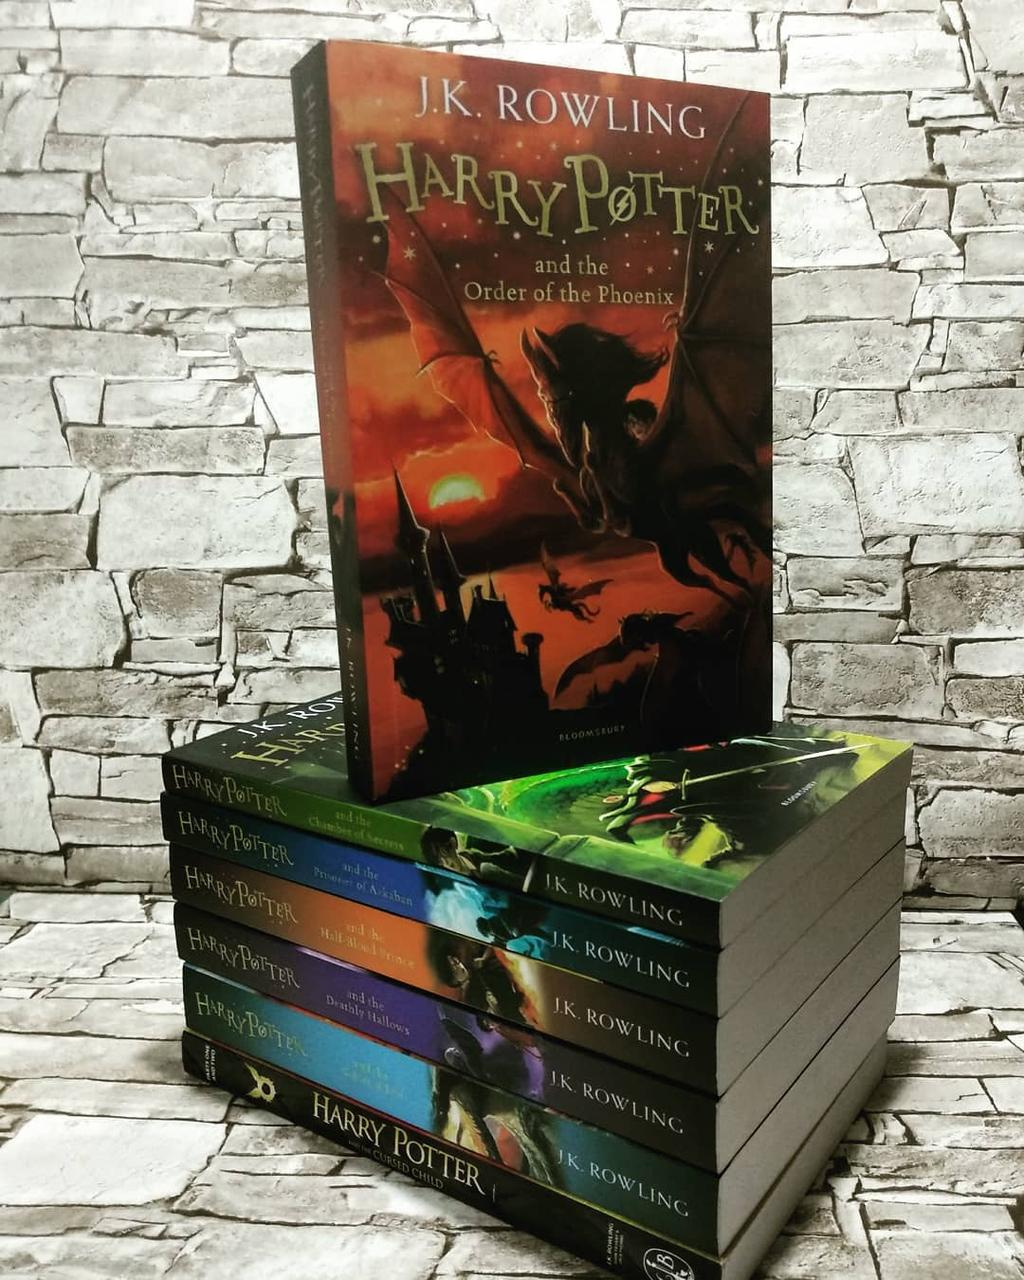 Набор книг Гарри Поттер Джоан Роулинг, Harry Potter английском языке, полный набор 8 книг